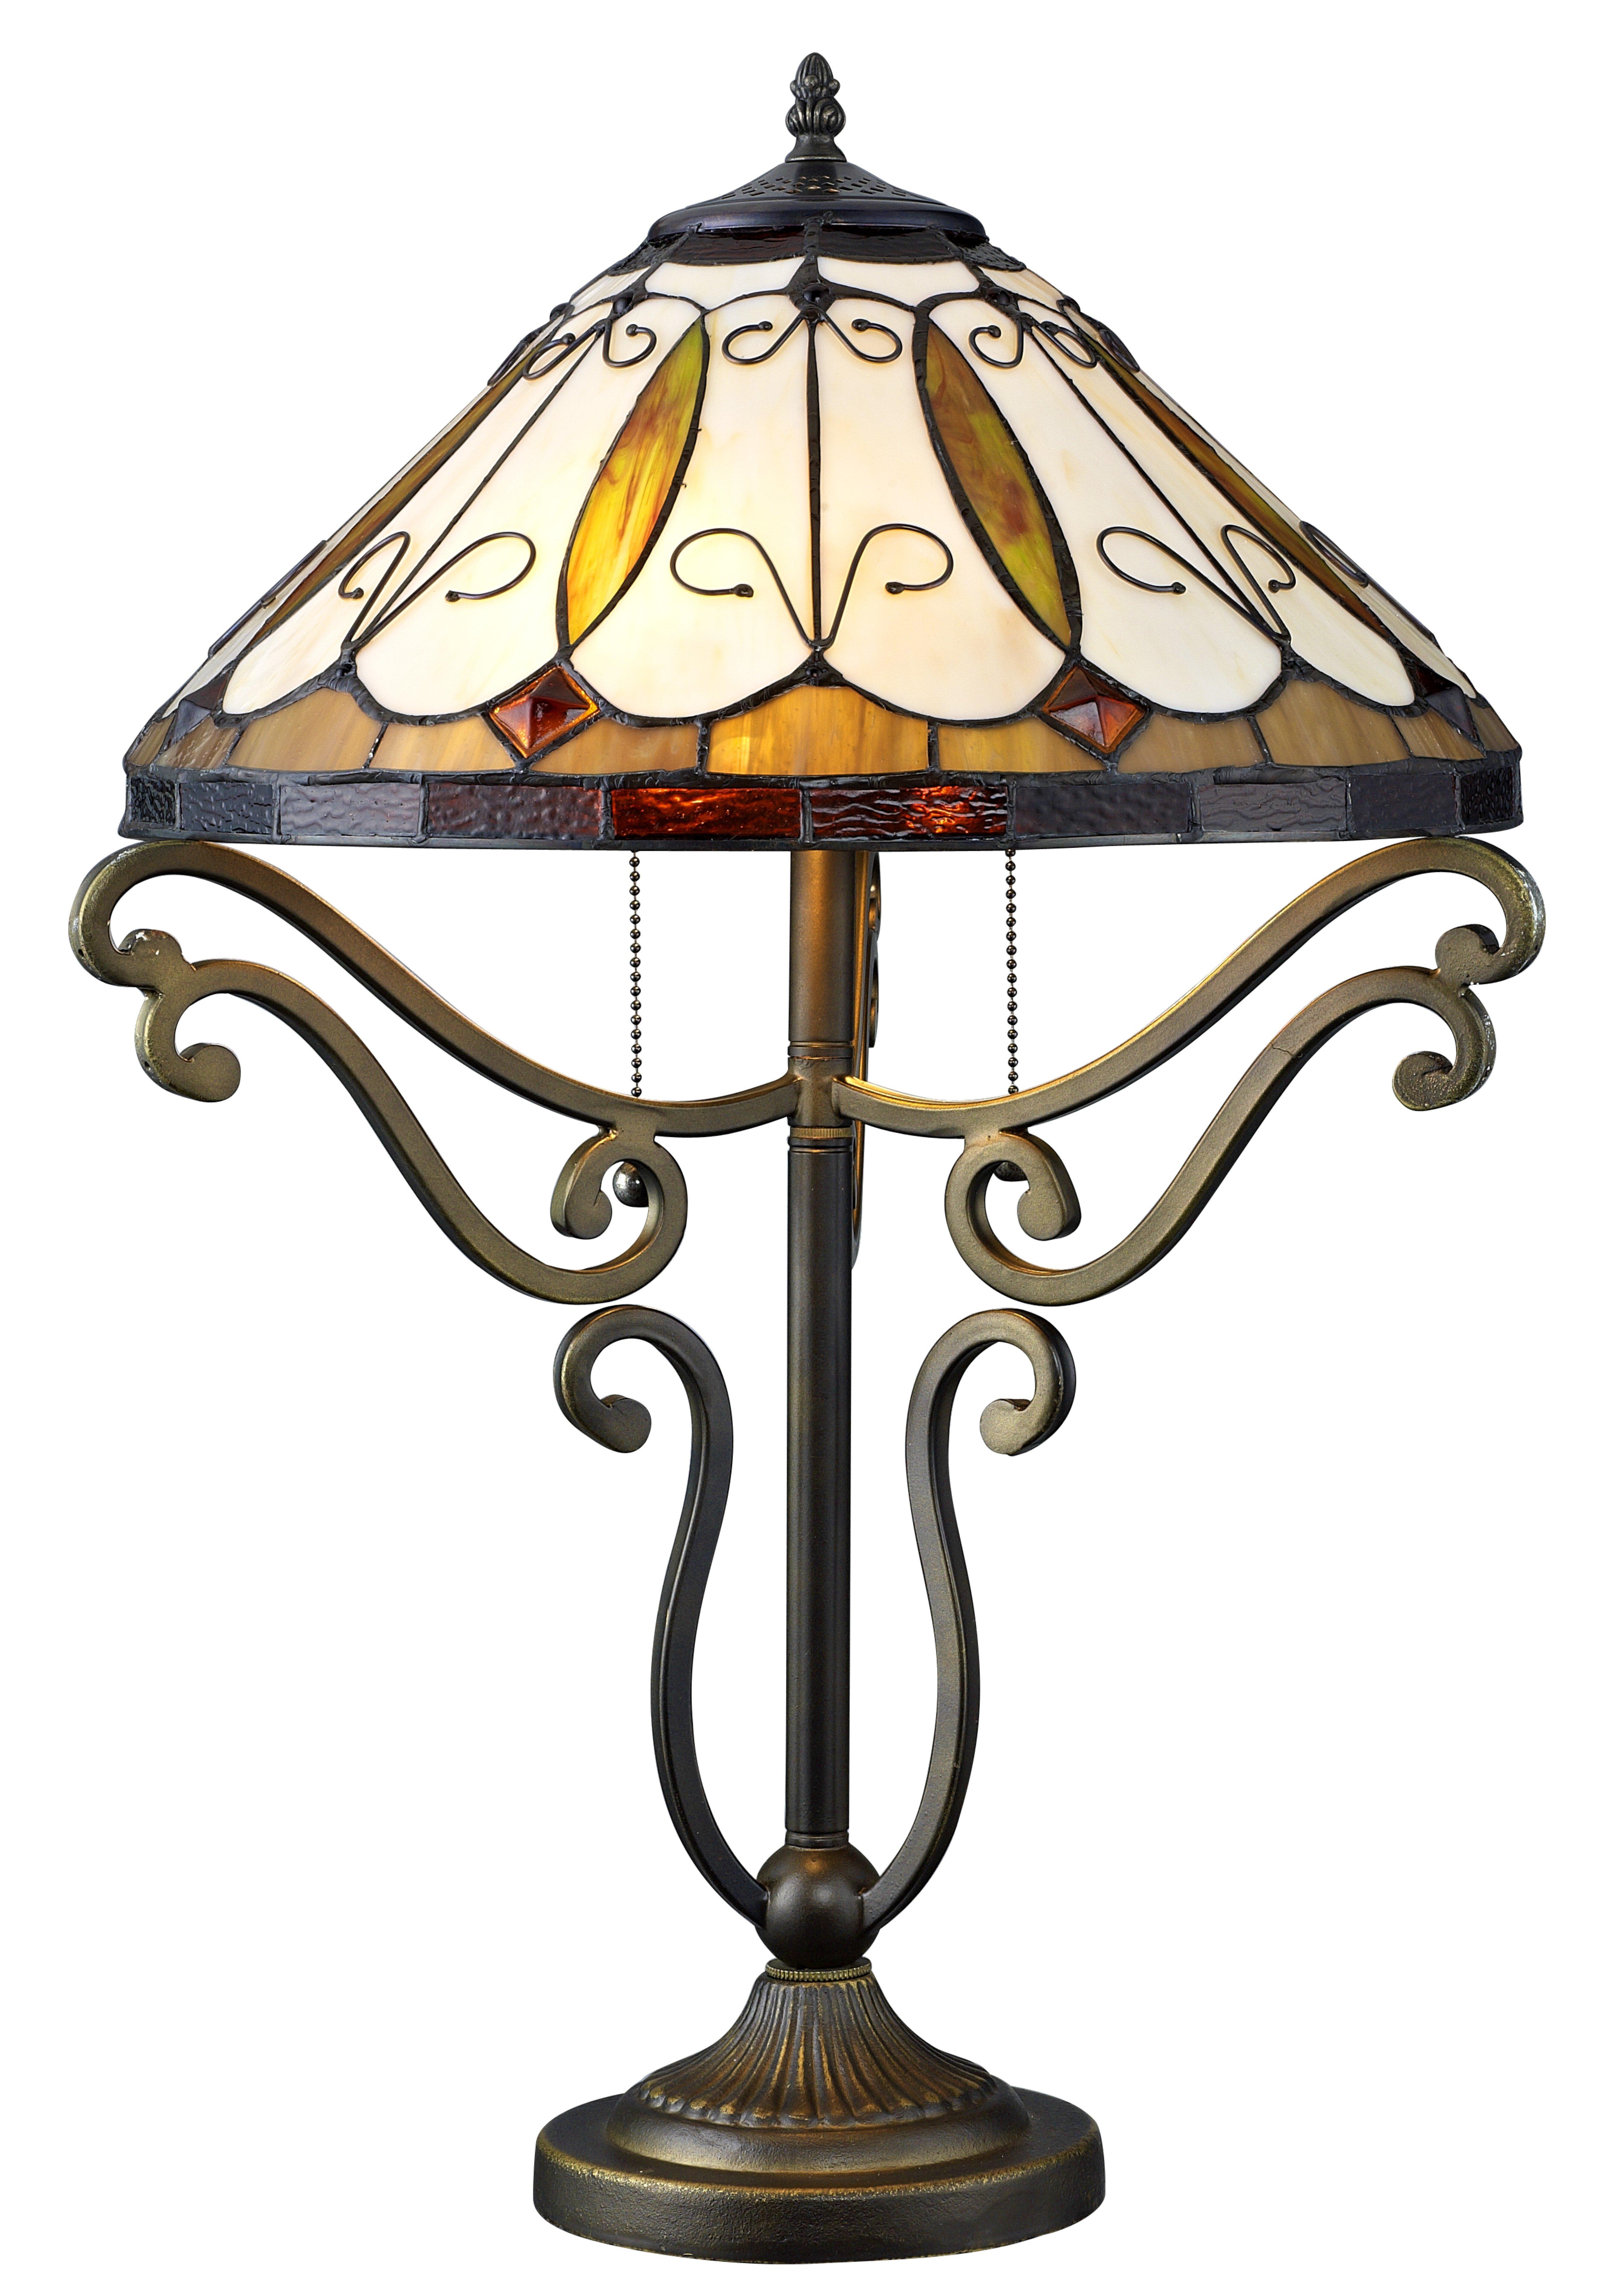 Astoria grand preston 24 empire table lamp reviews wayfair